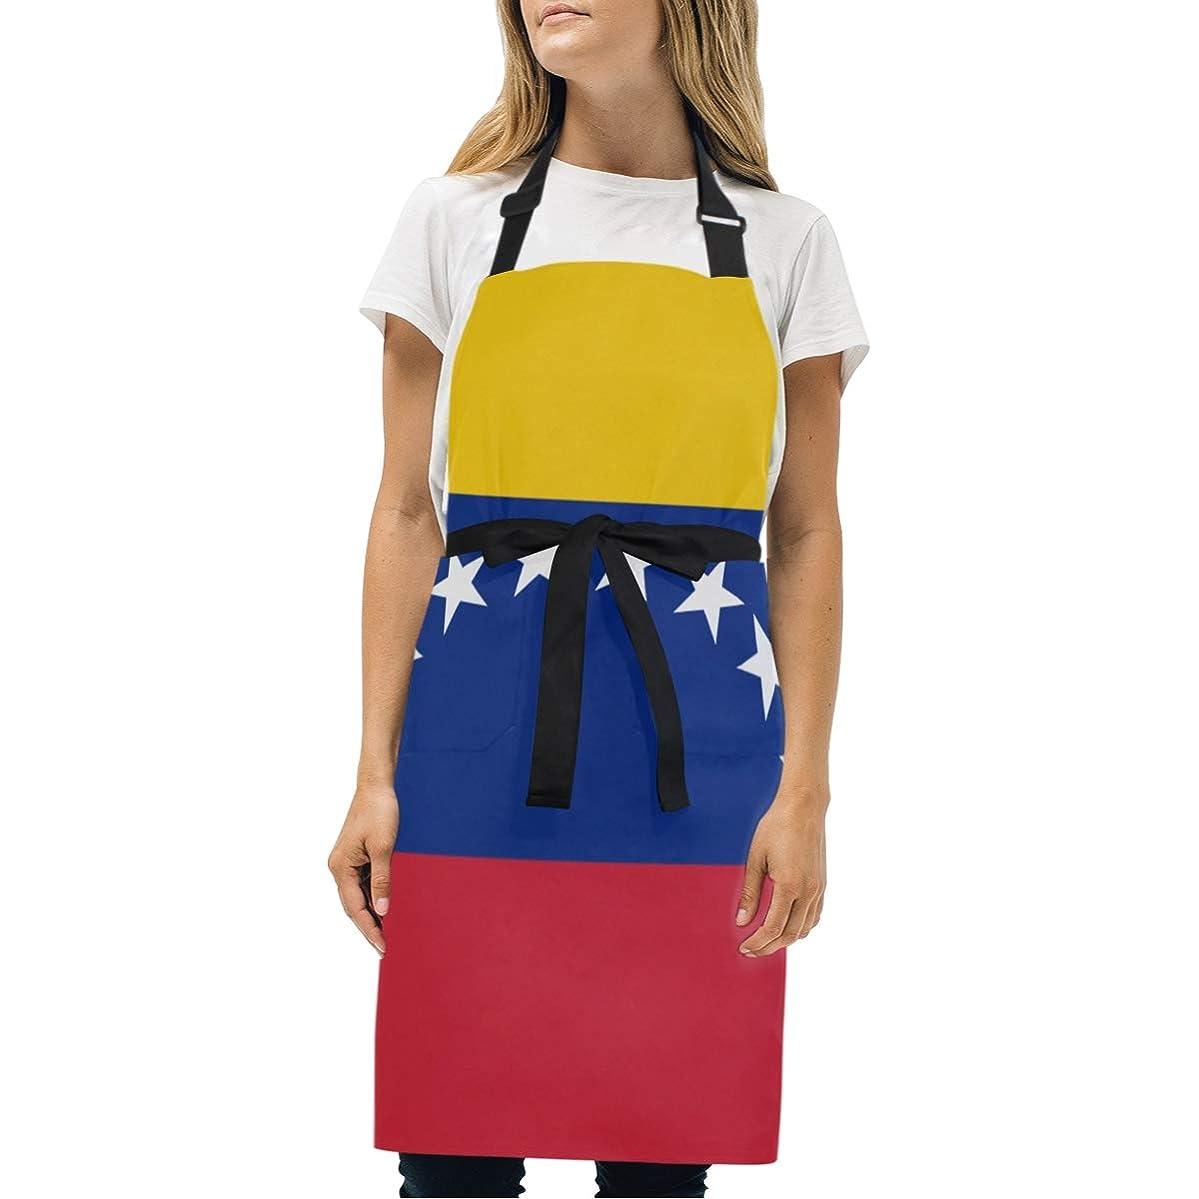 BeliveFinds Flag of Venezuela Proud Adjustable Bib Apron with Pockets Cooking Kitchen Party Aprons